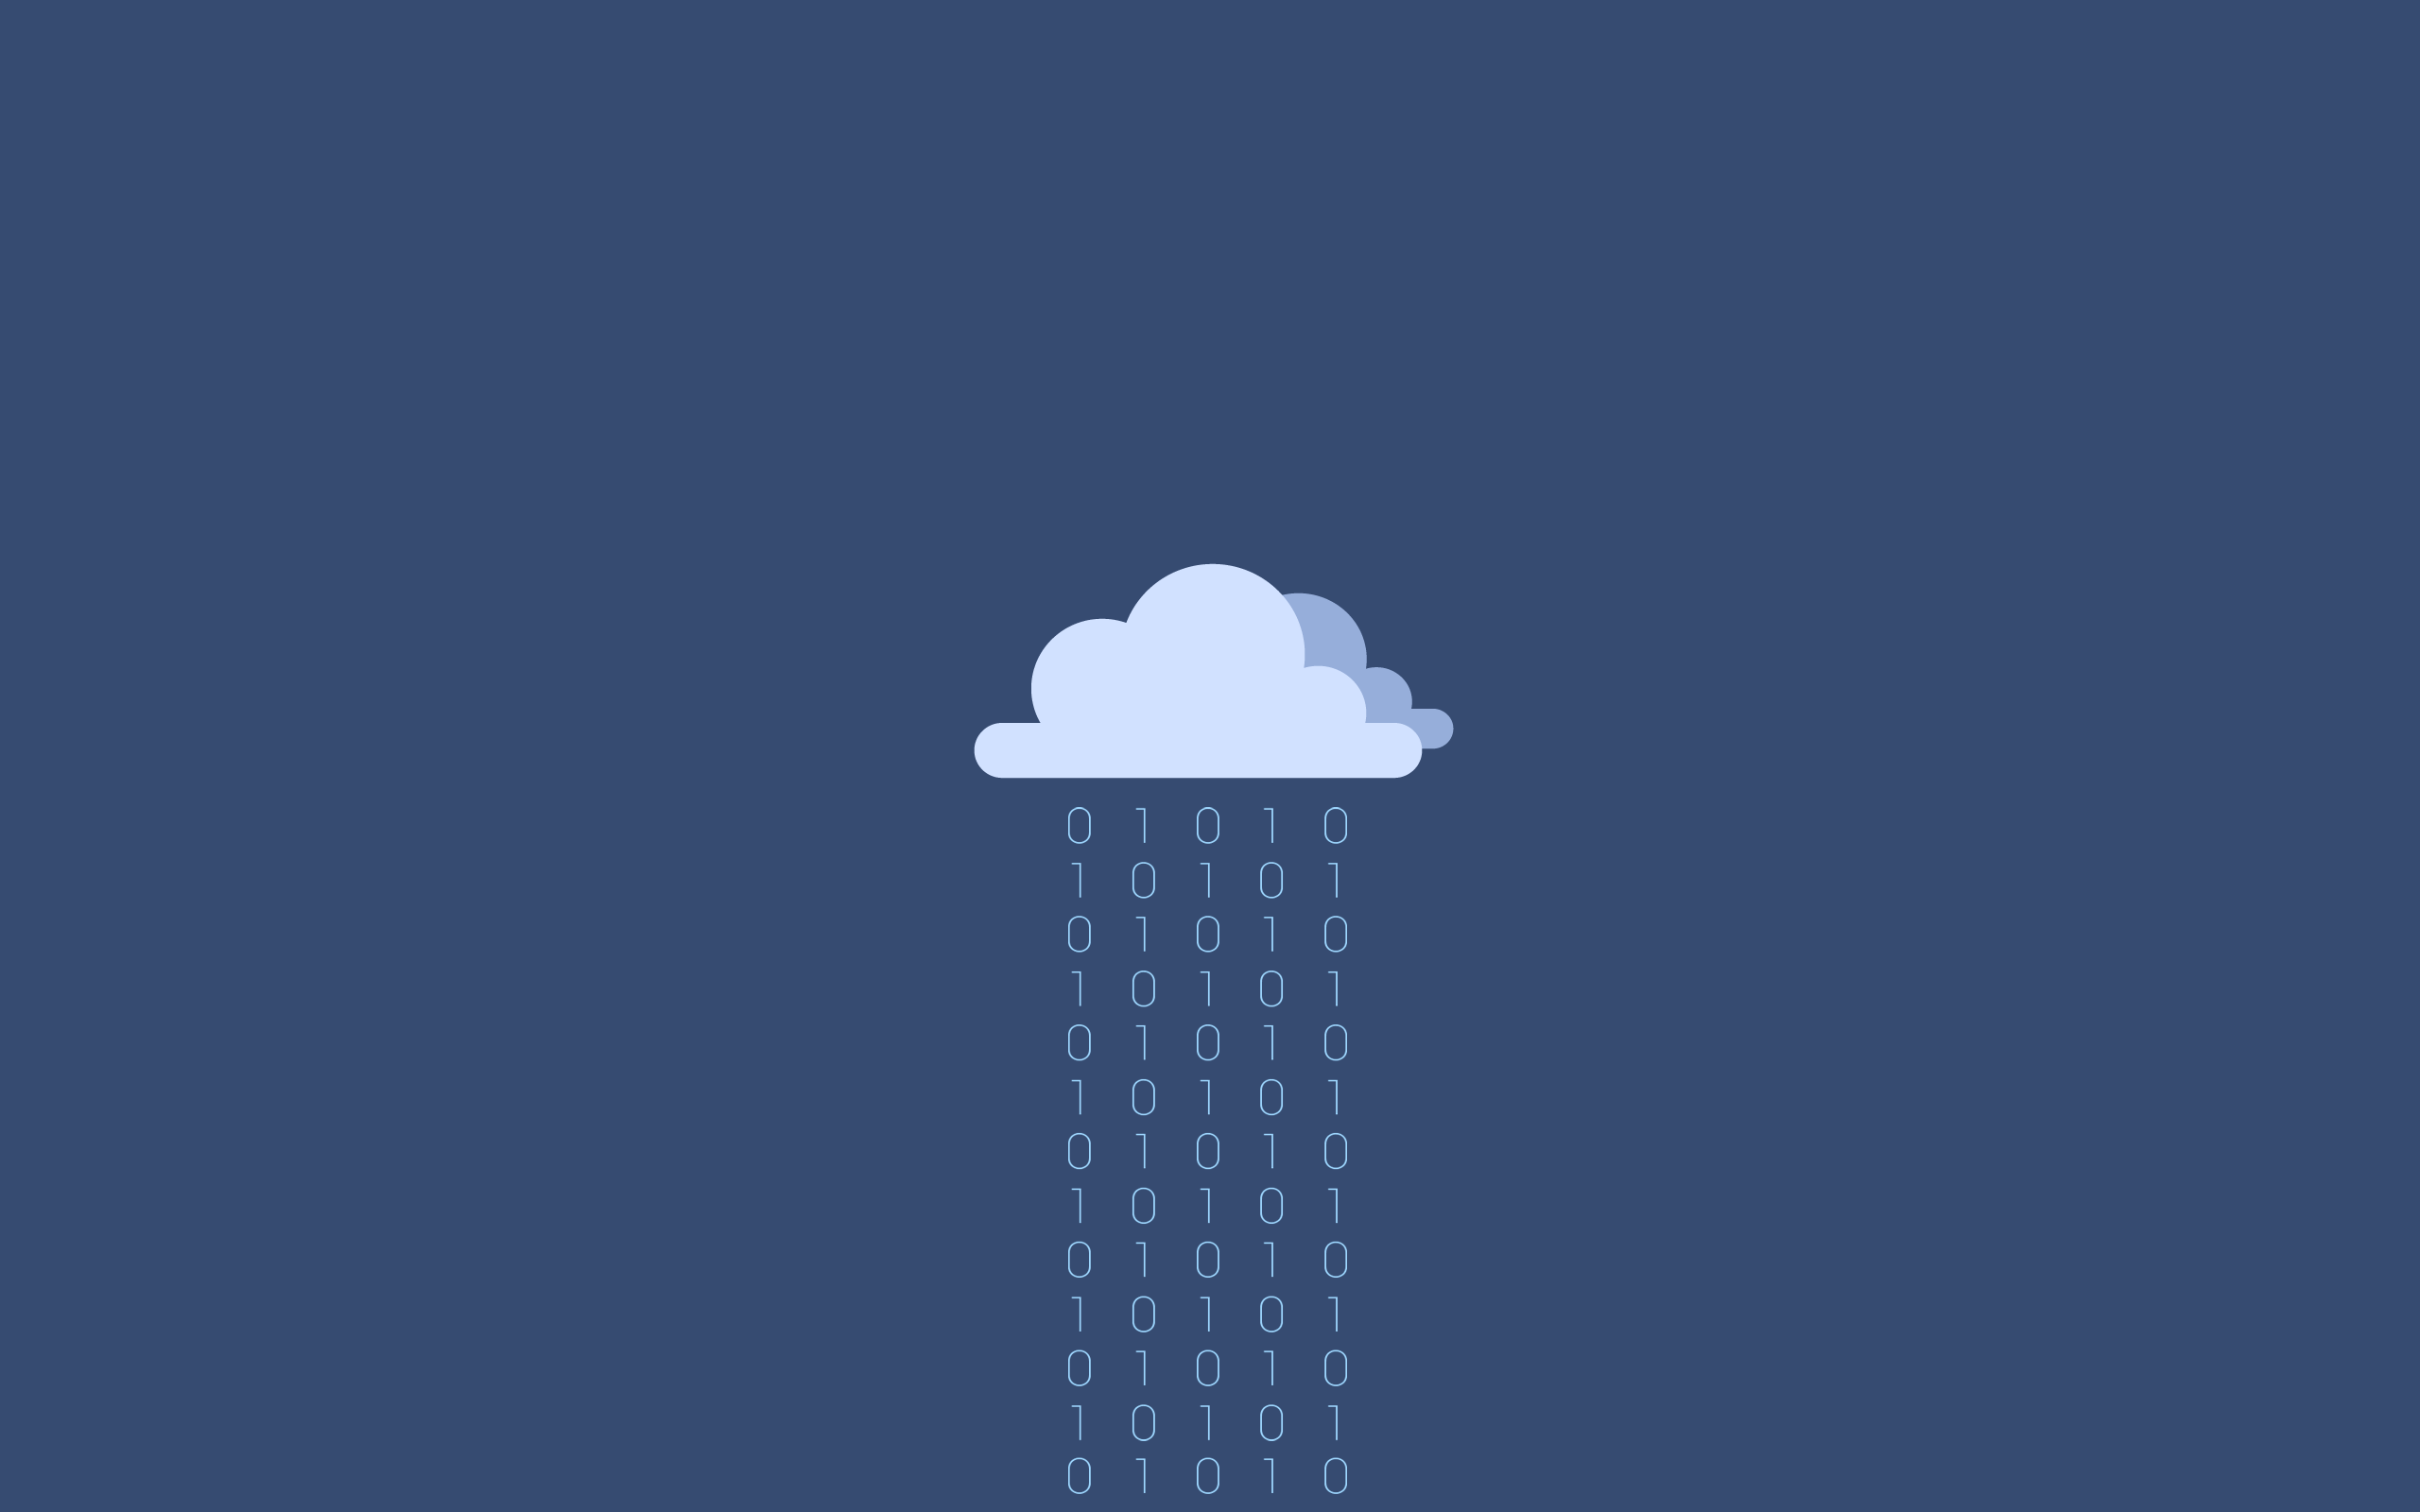 Binary Code Wallpapers x Wallpaper